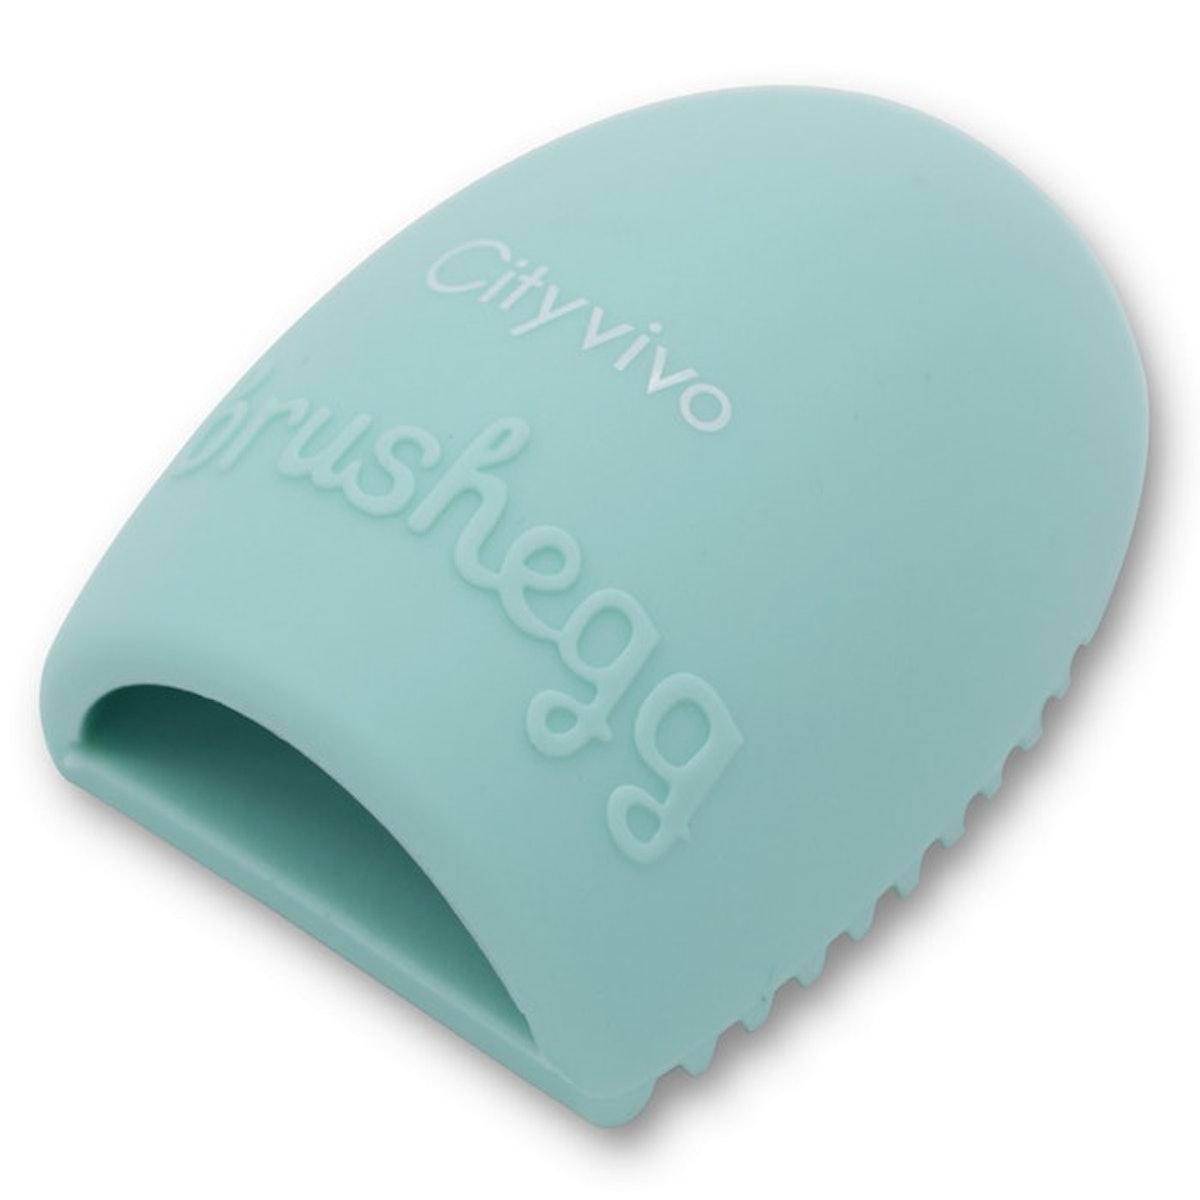 Cityvivo Makeup Brush Cleaning Tool